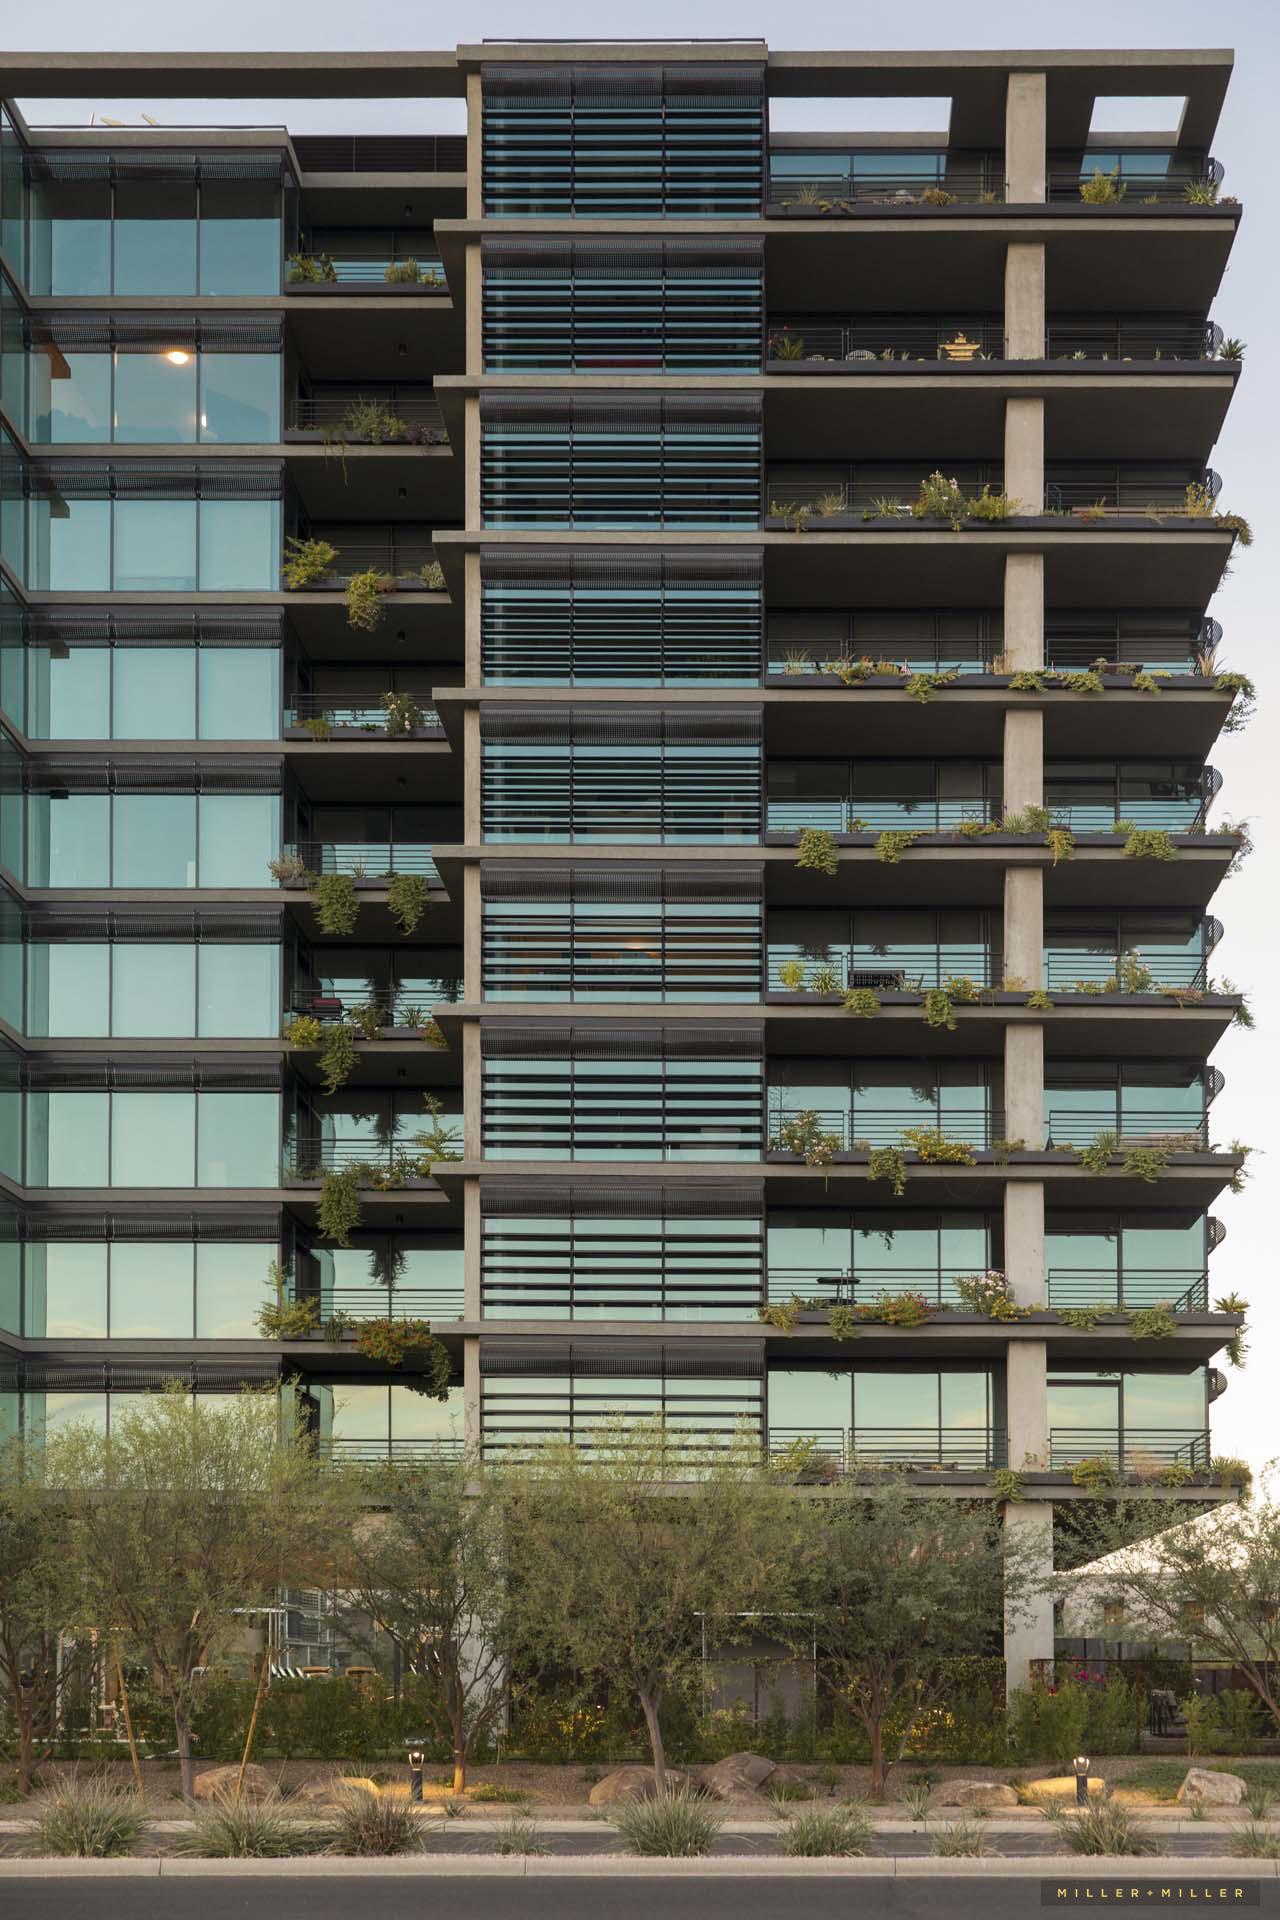 vertical-landscaping-modern-buliding